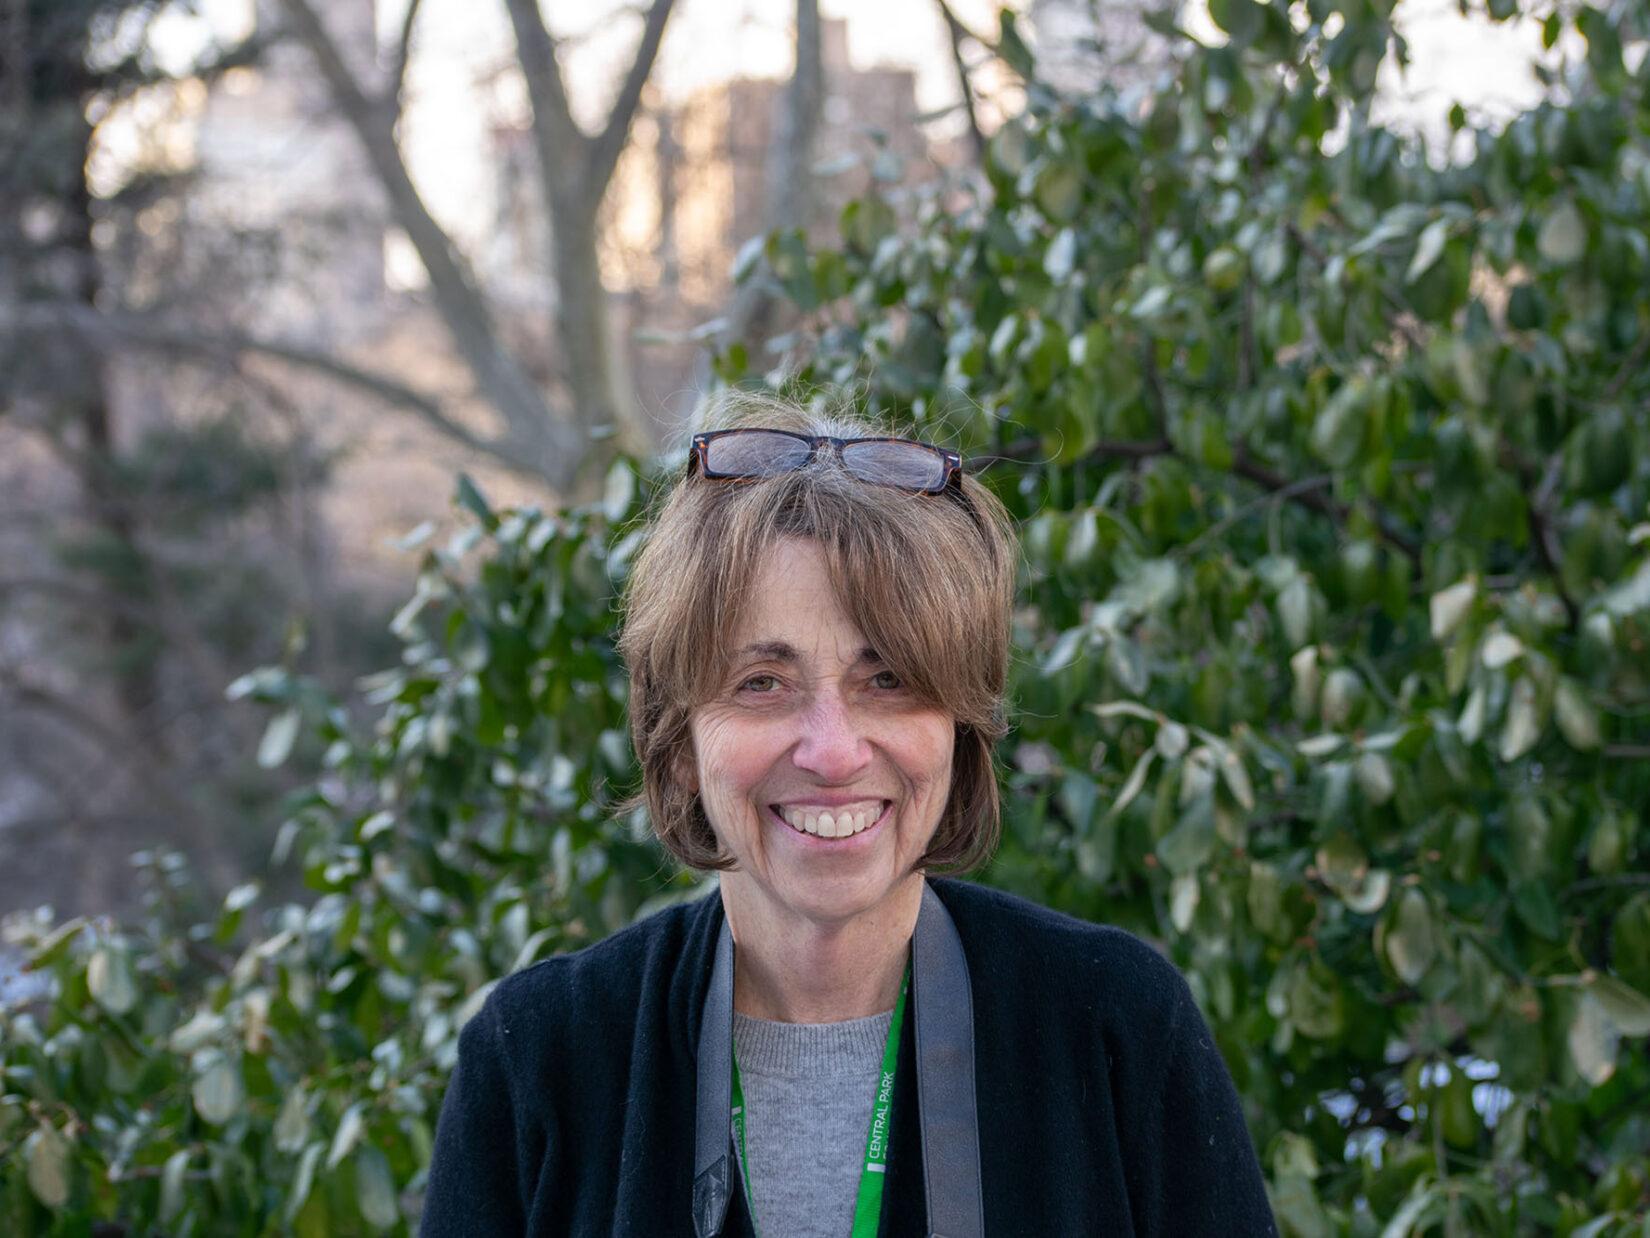 Portrait image of Sara Cedar Miller, seen in front of Park greenery